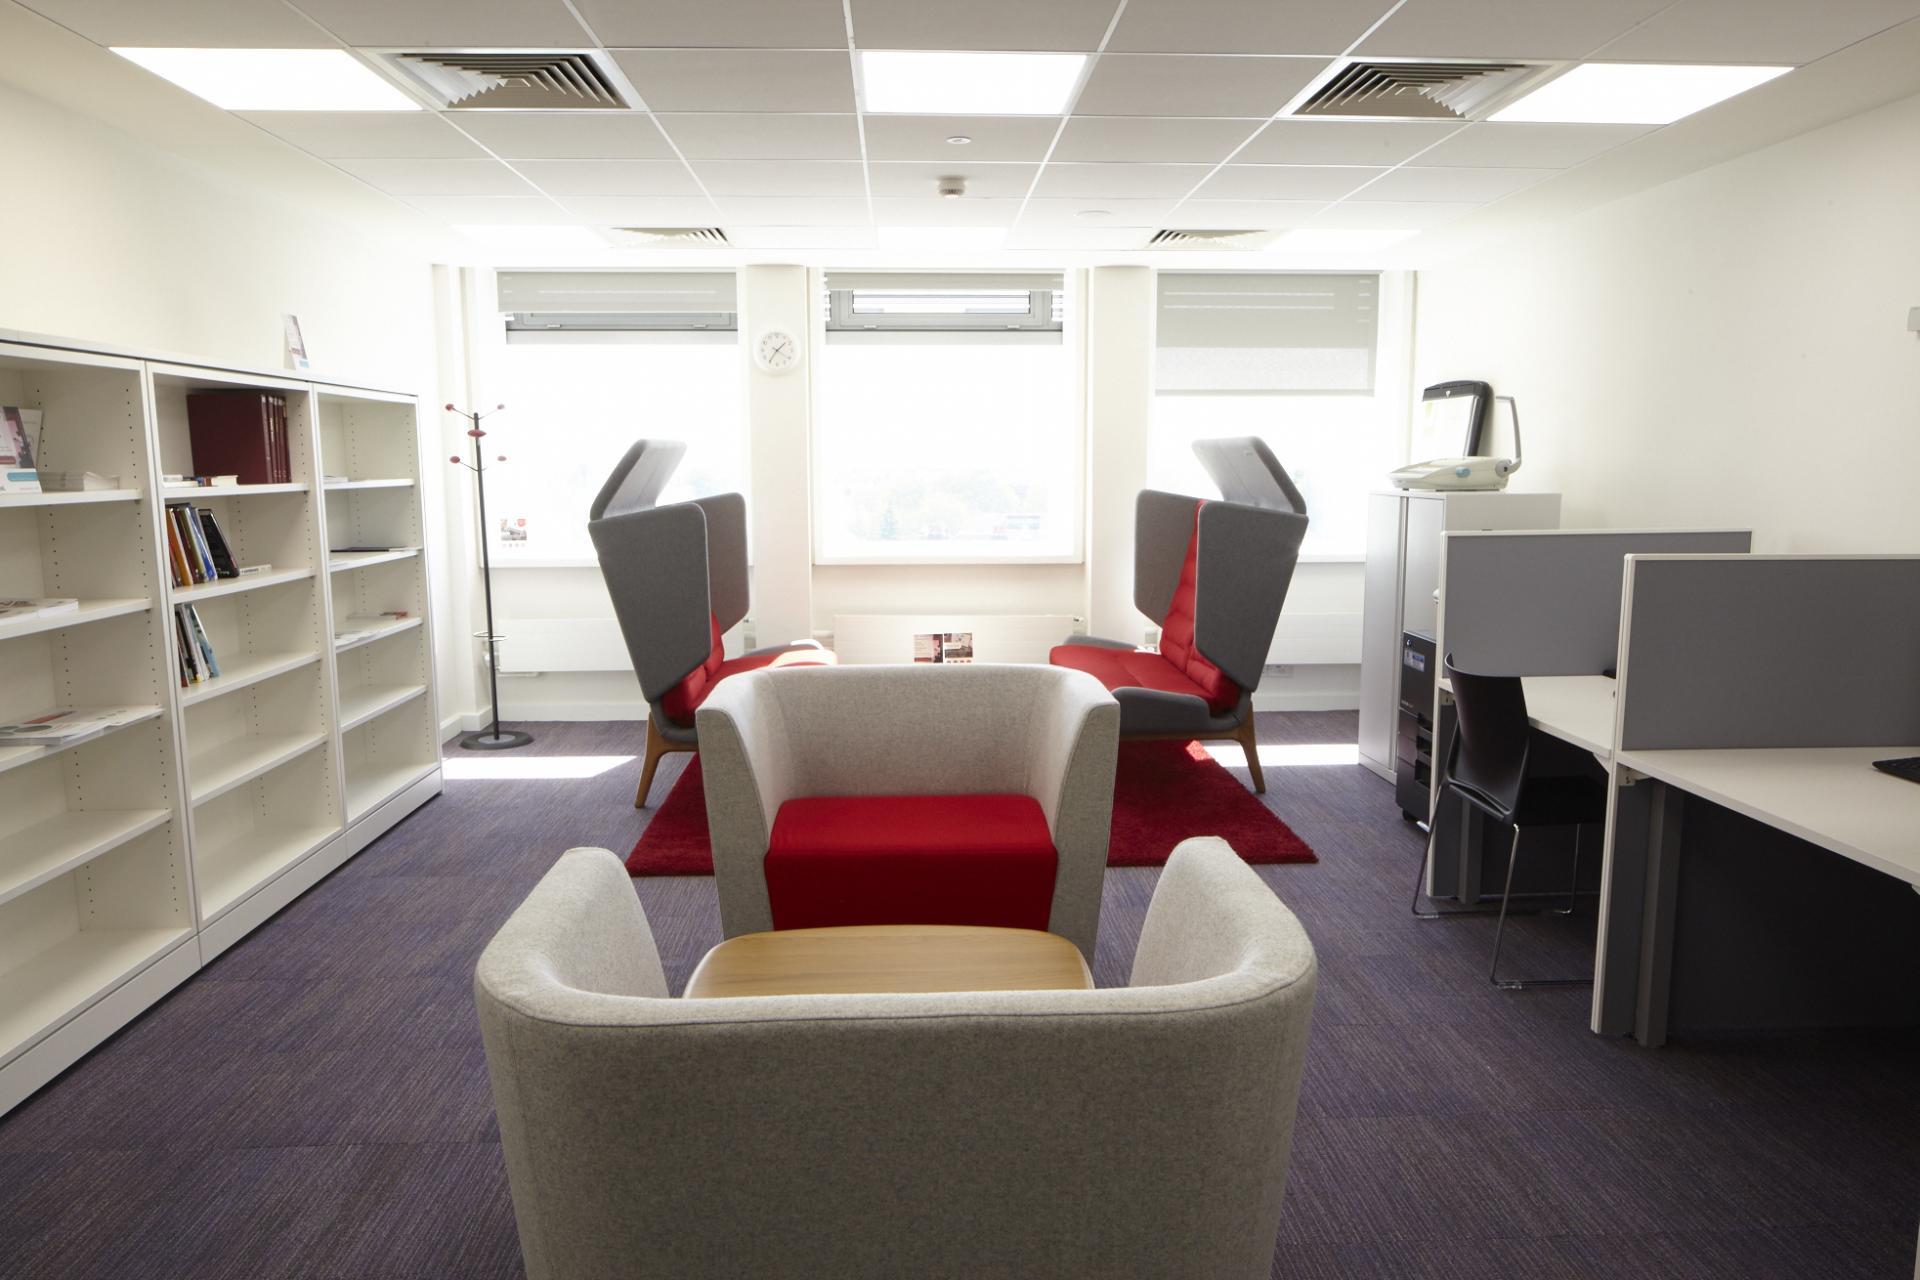 Bsi inspiration day case study kitemark centre tests for Office design regulations uk